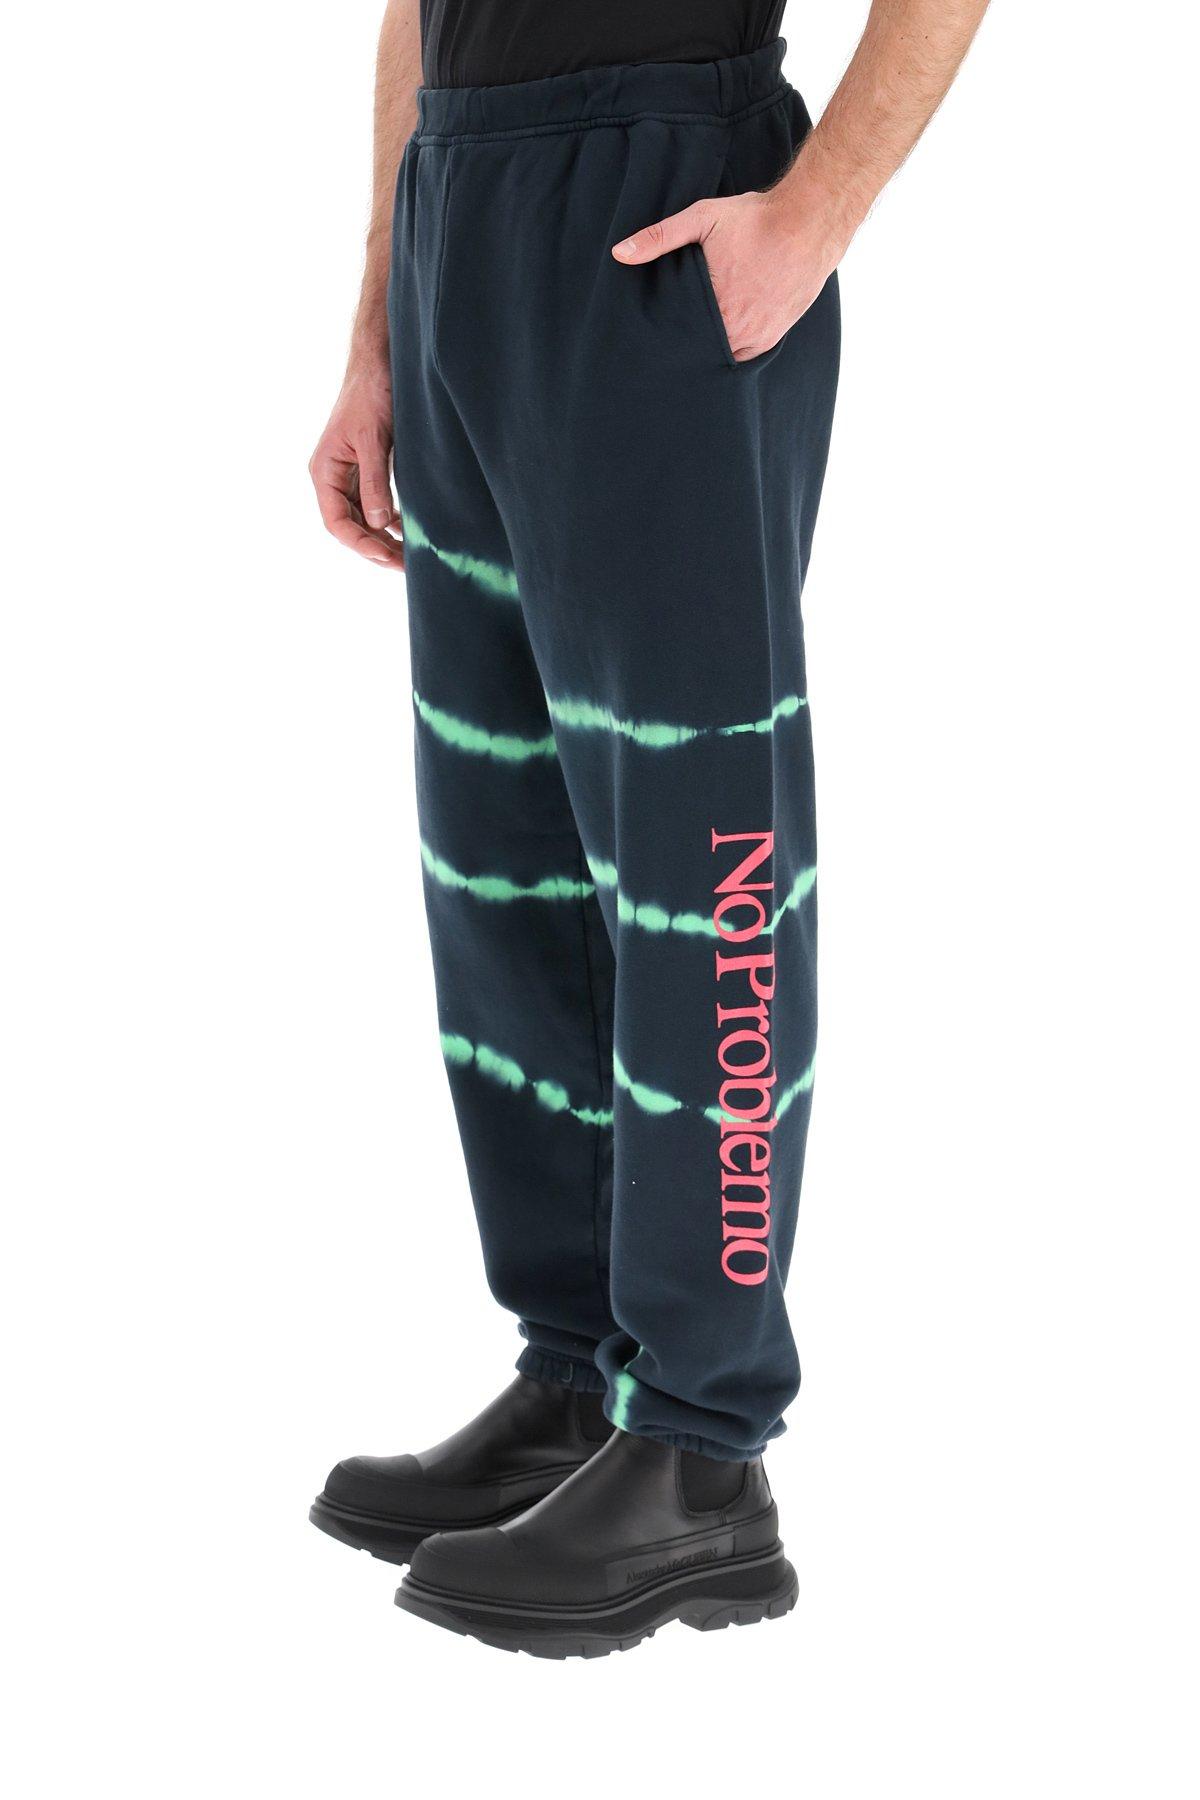 Aries jogger tie-dye stampa fluo no problemo